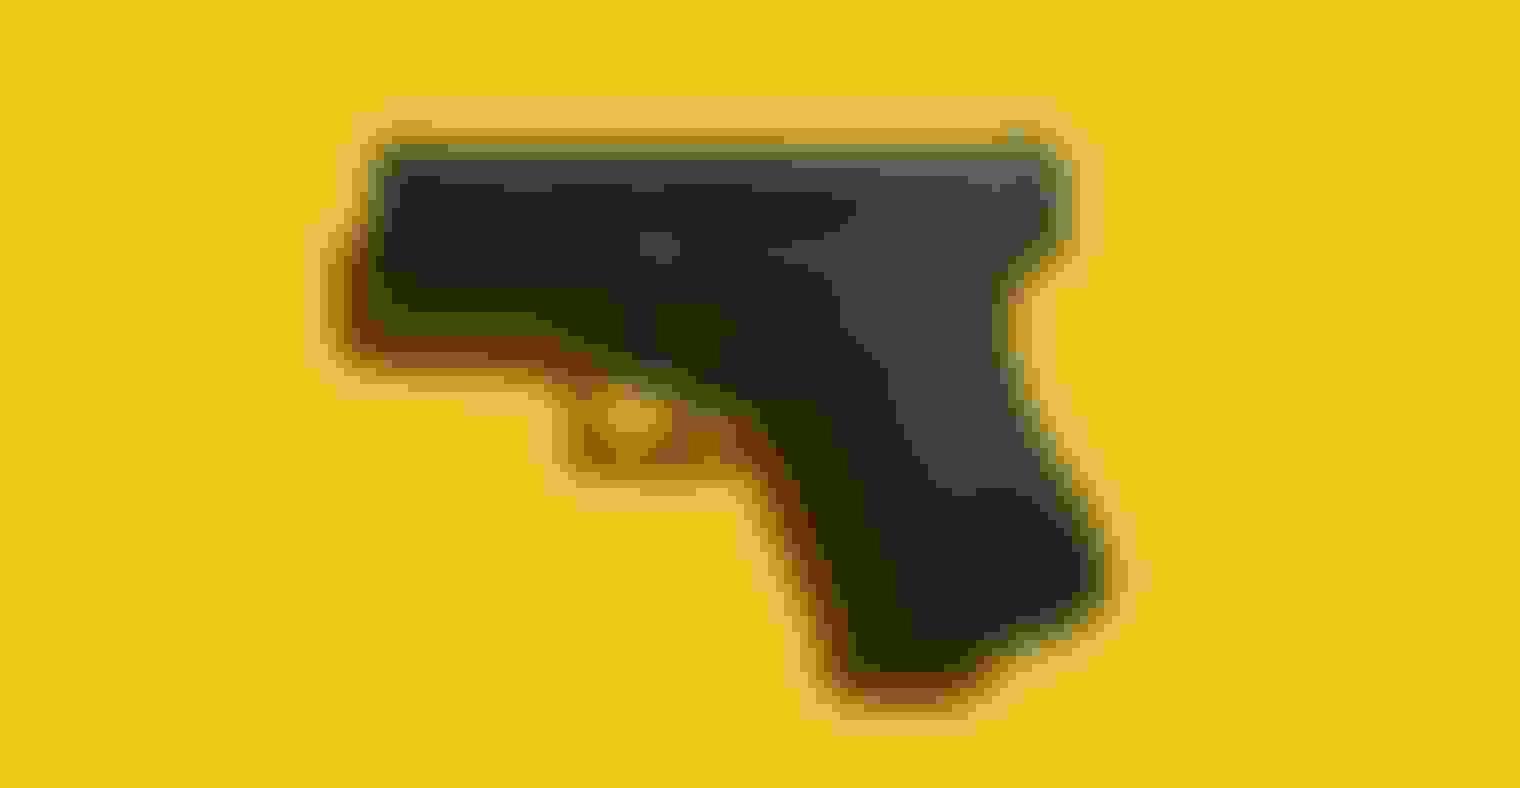 A handgun presented against a yellow background